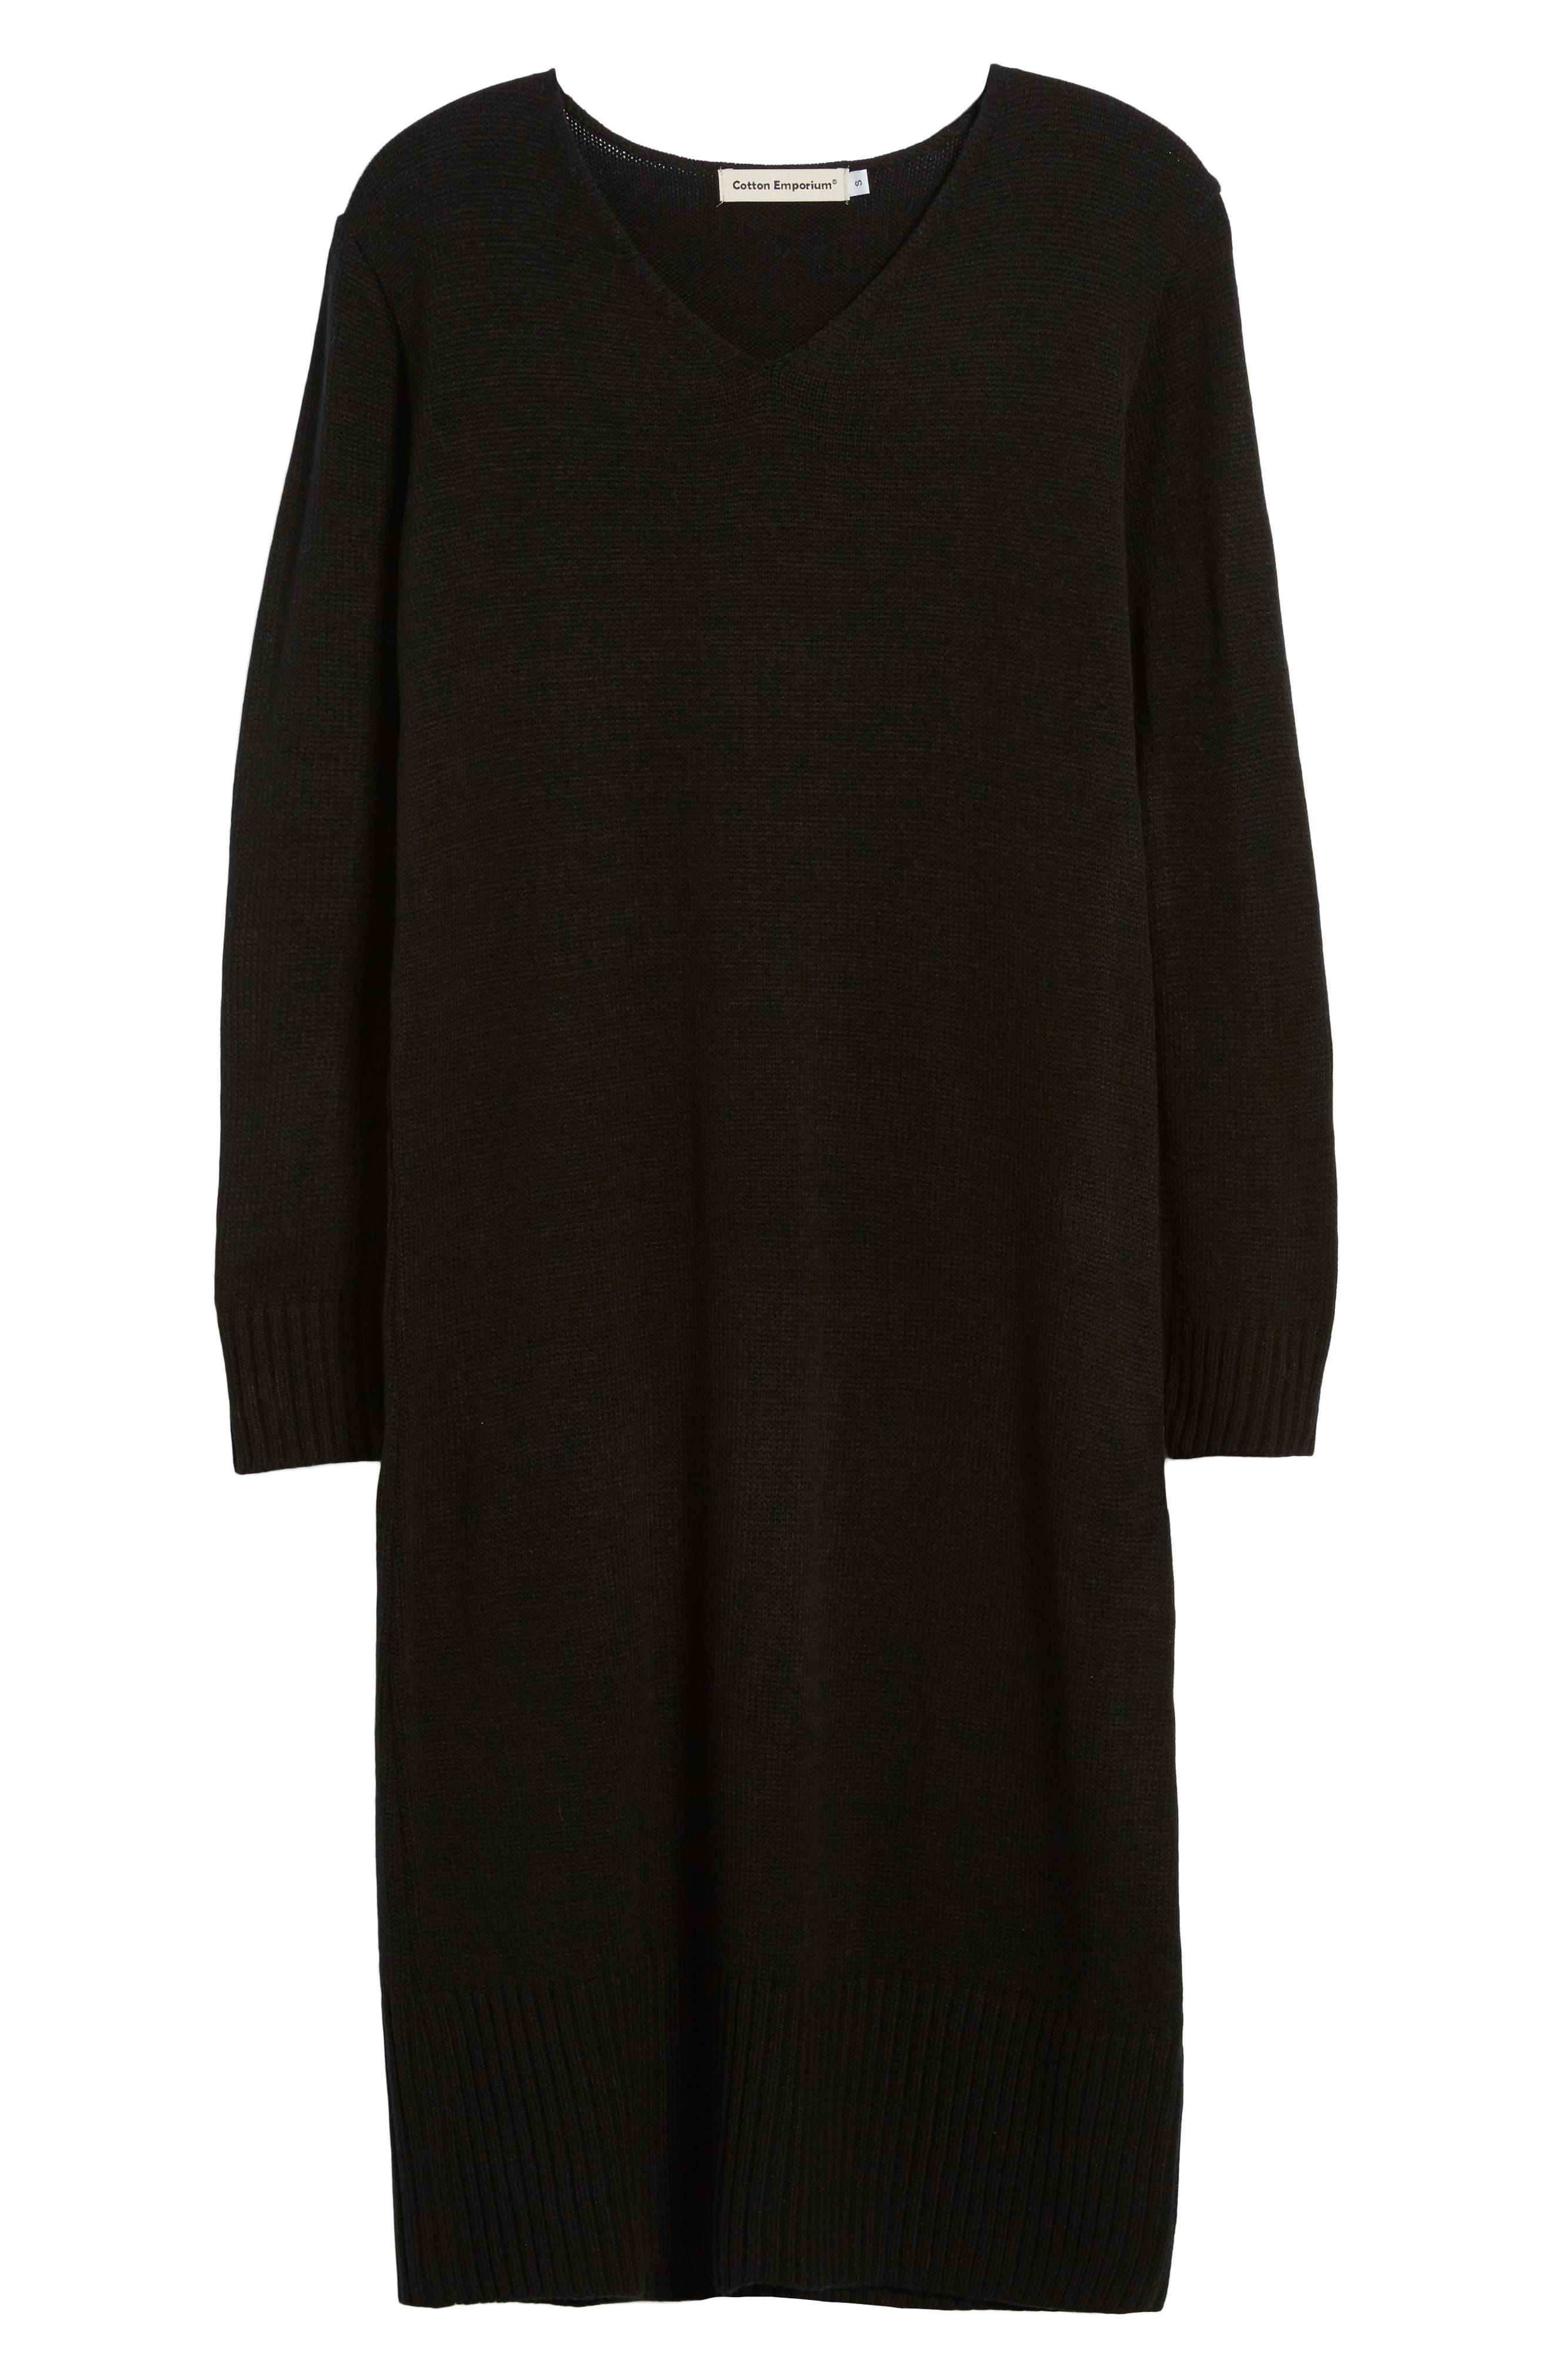 Sweater Dress,                             Alternate thumbnail 6, color,                             Black